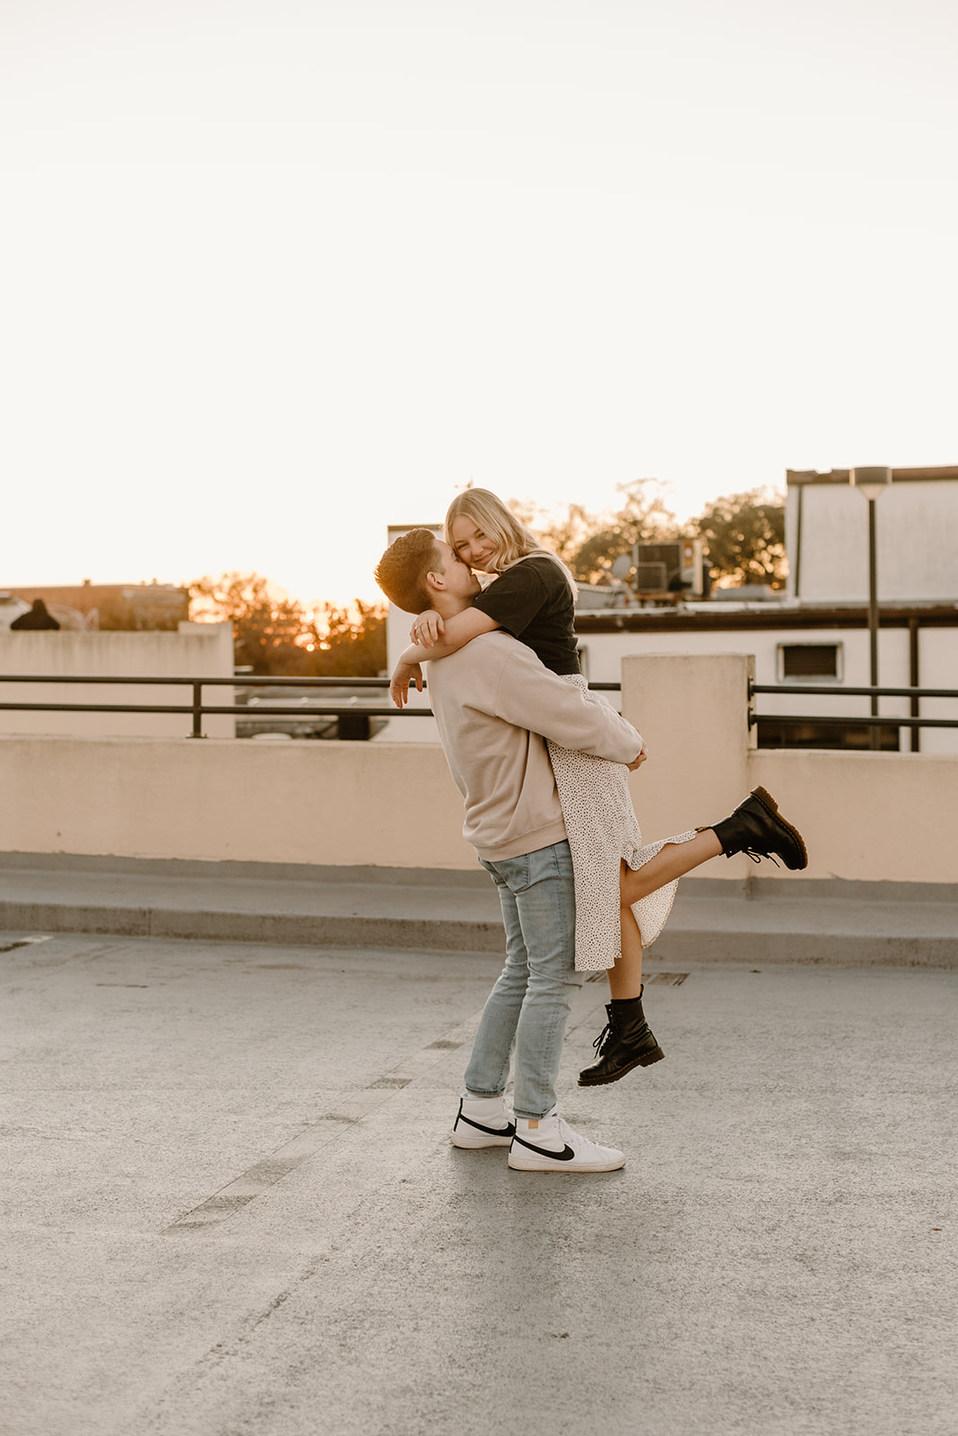 Lakeland Rooftop Couples Photoshoot